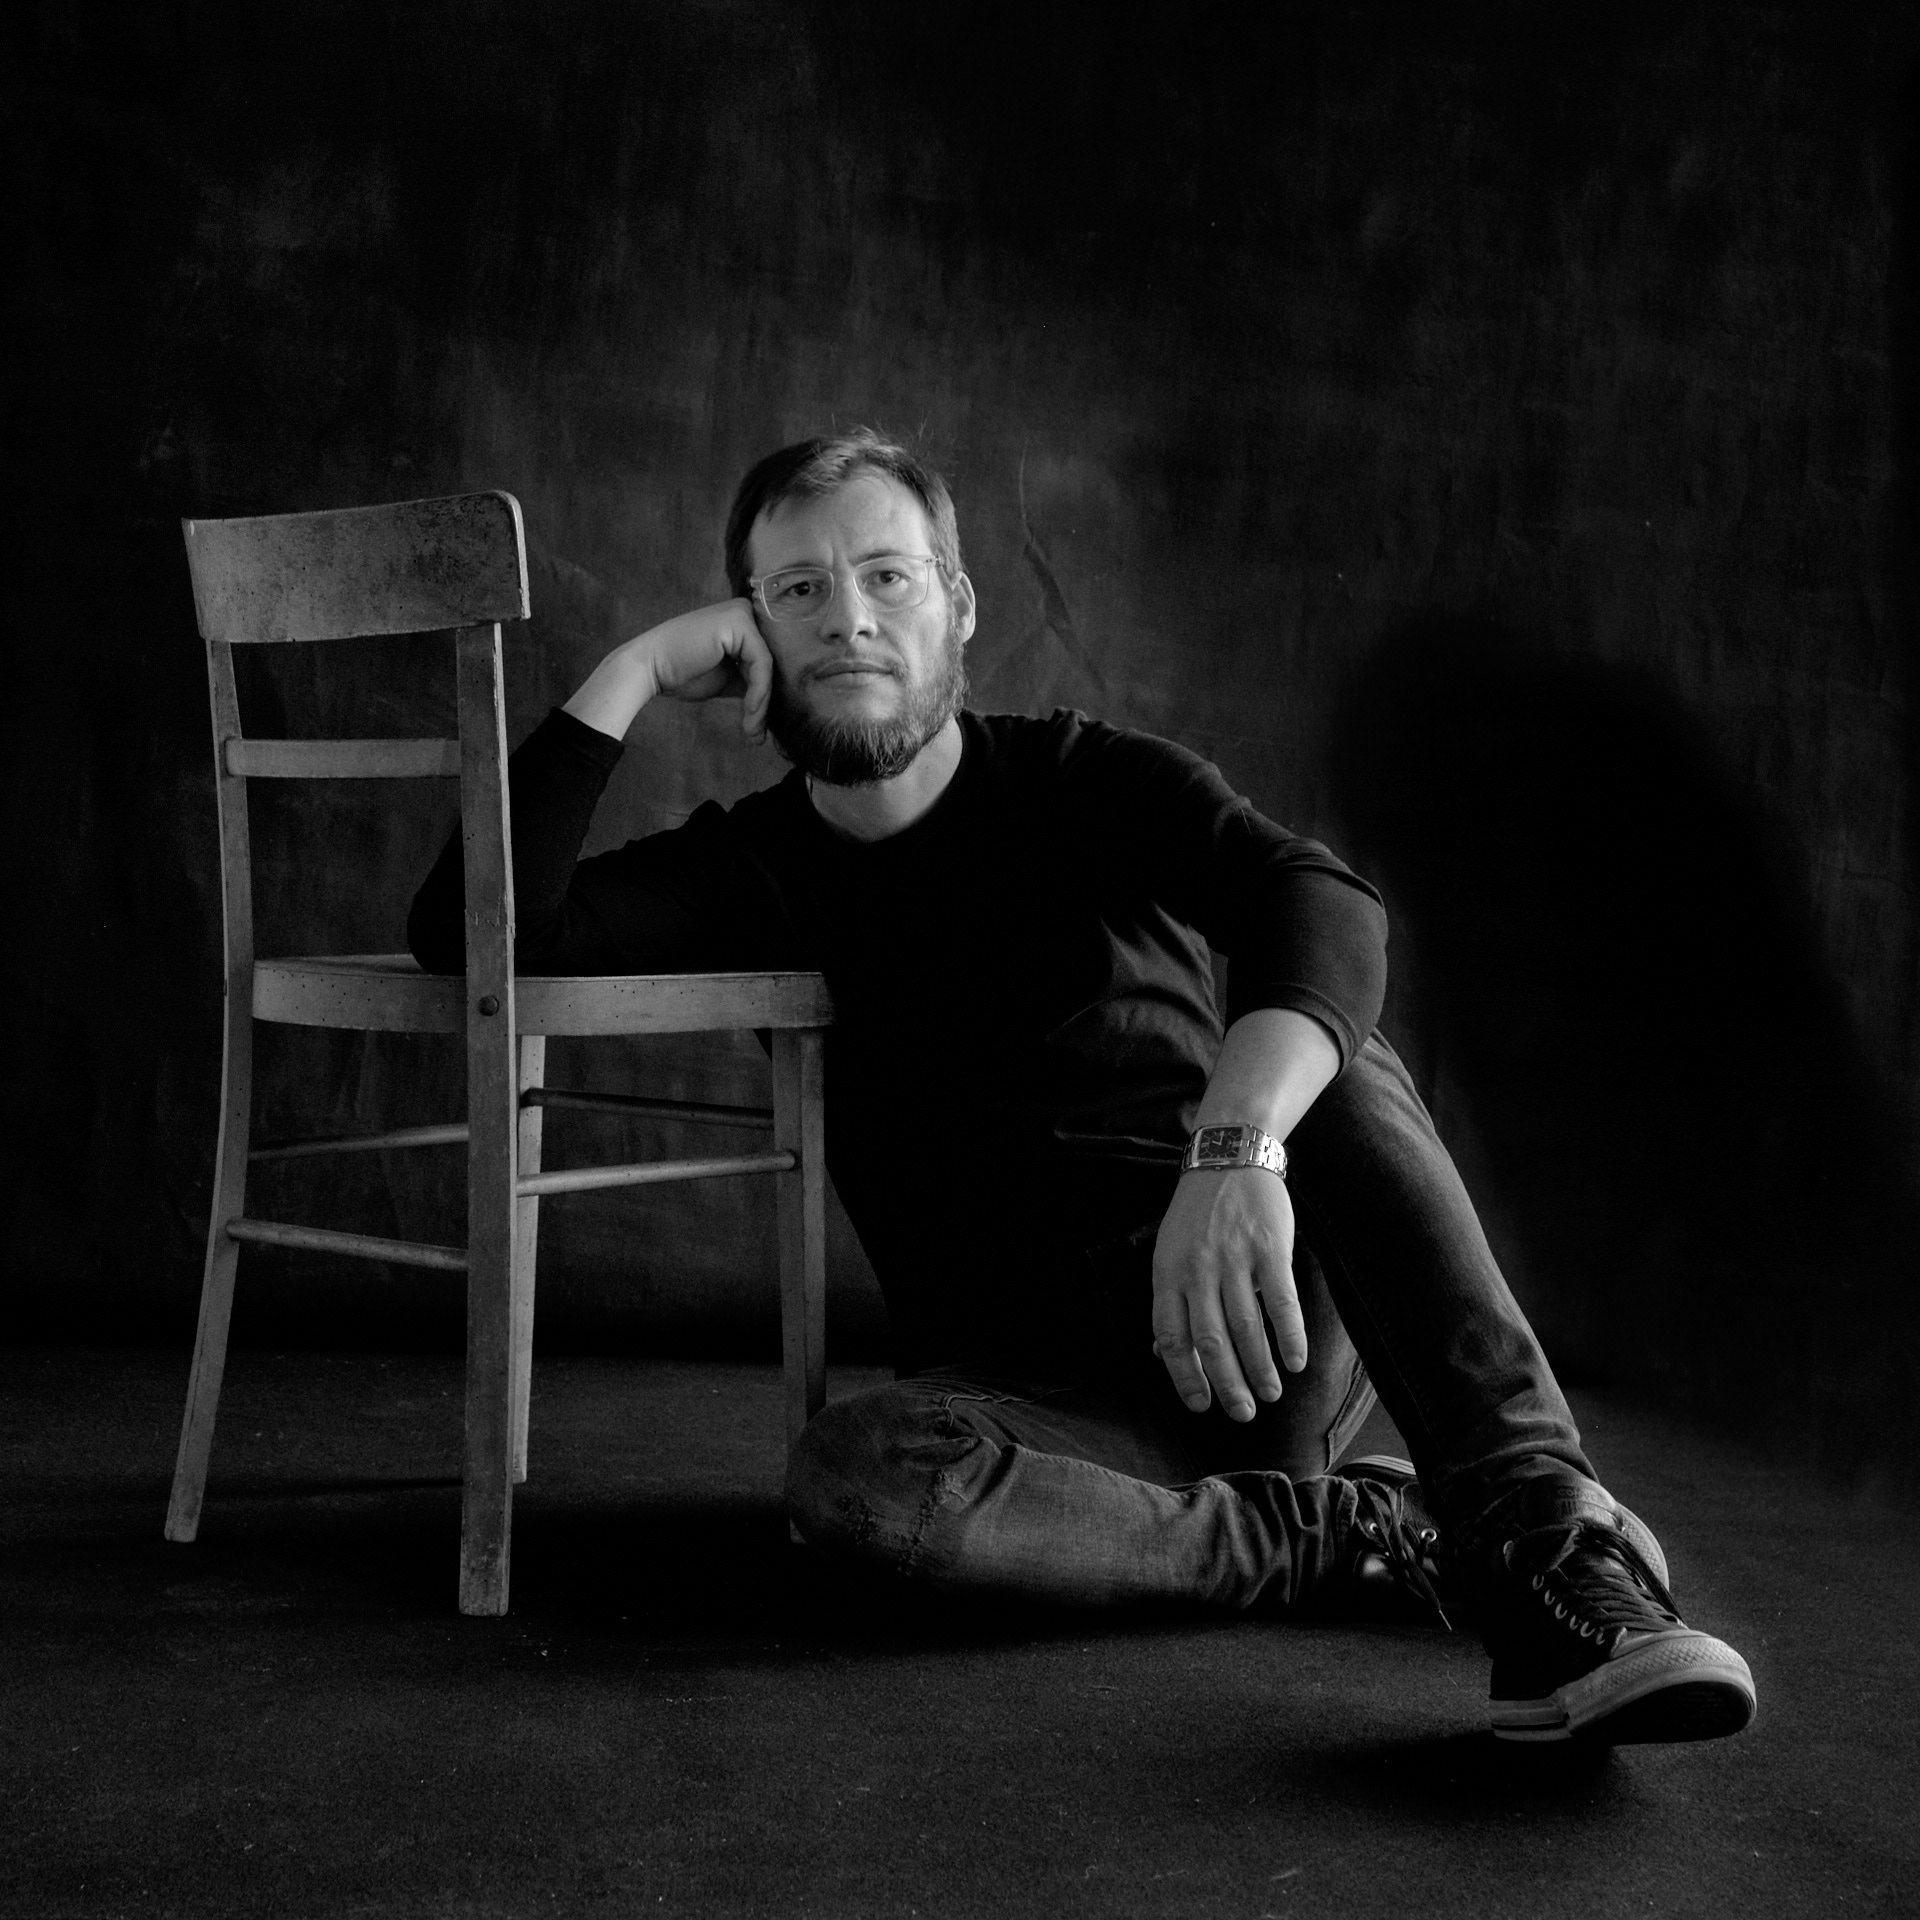 fotografo documental de bodas foto en blanco y negro del fotografo fabrizio maulella